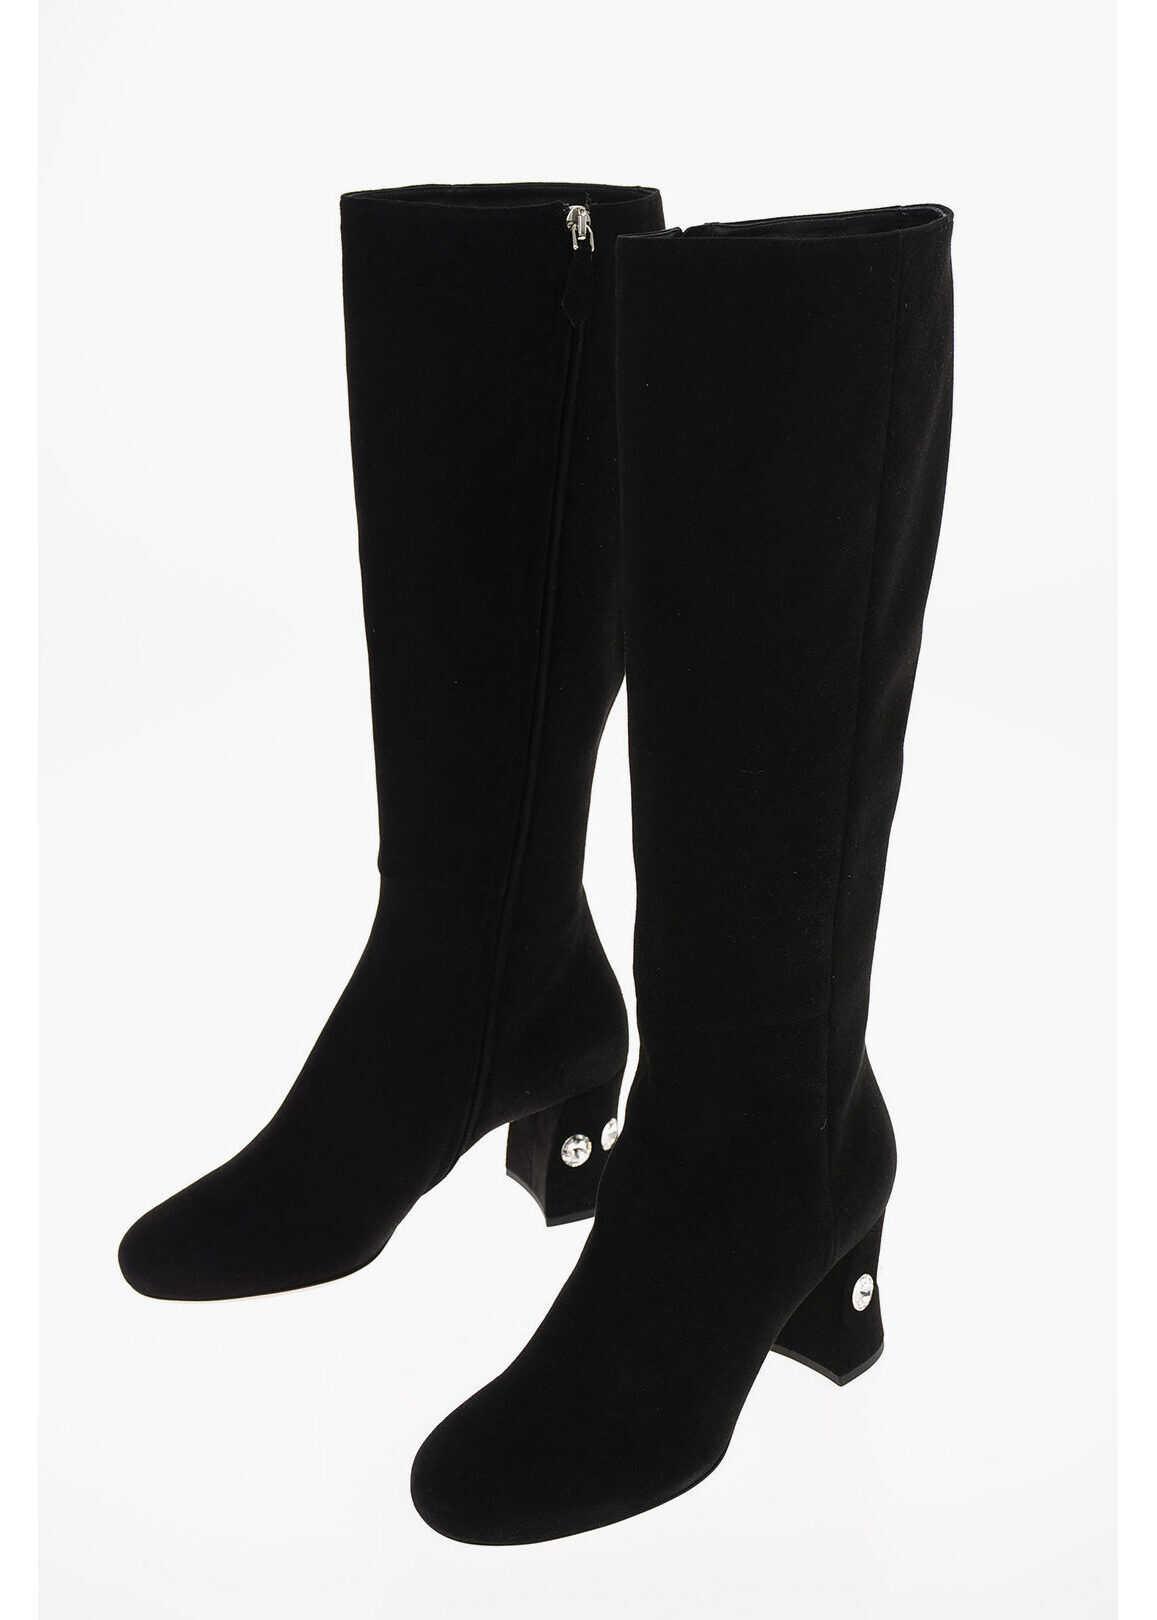 Miu Miu Suede Knee Length Boots with Jewel Heel 7 Cm BLACK imagine b-mall.ro